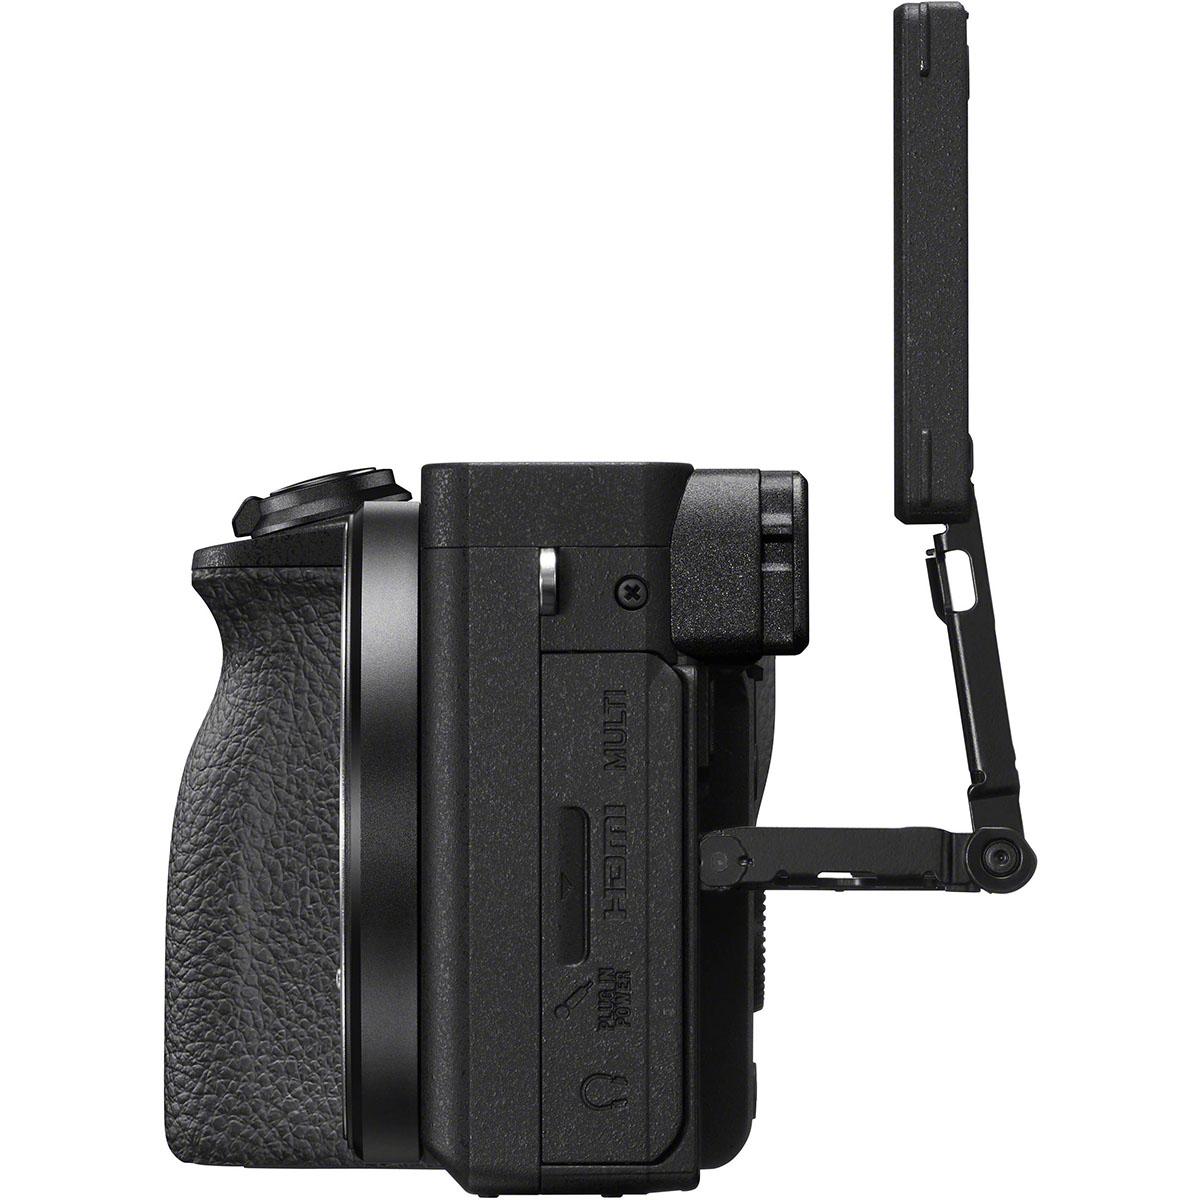 دوربین سونی مدل Alpha a6600 (بادی)